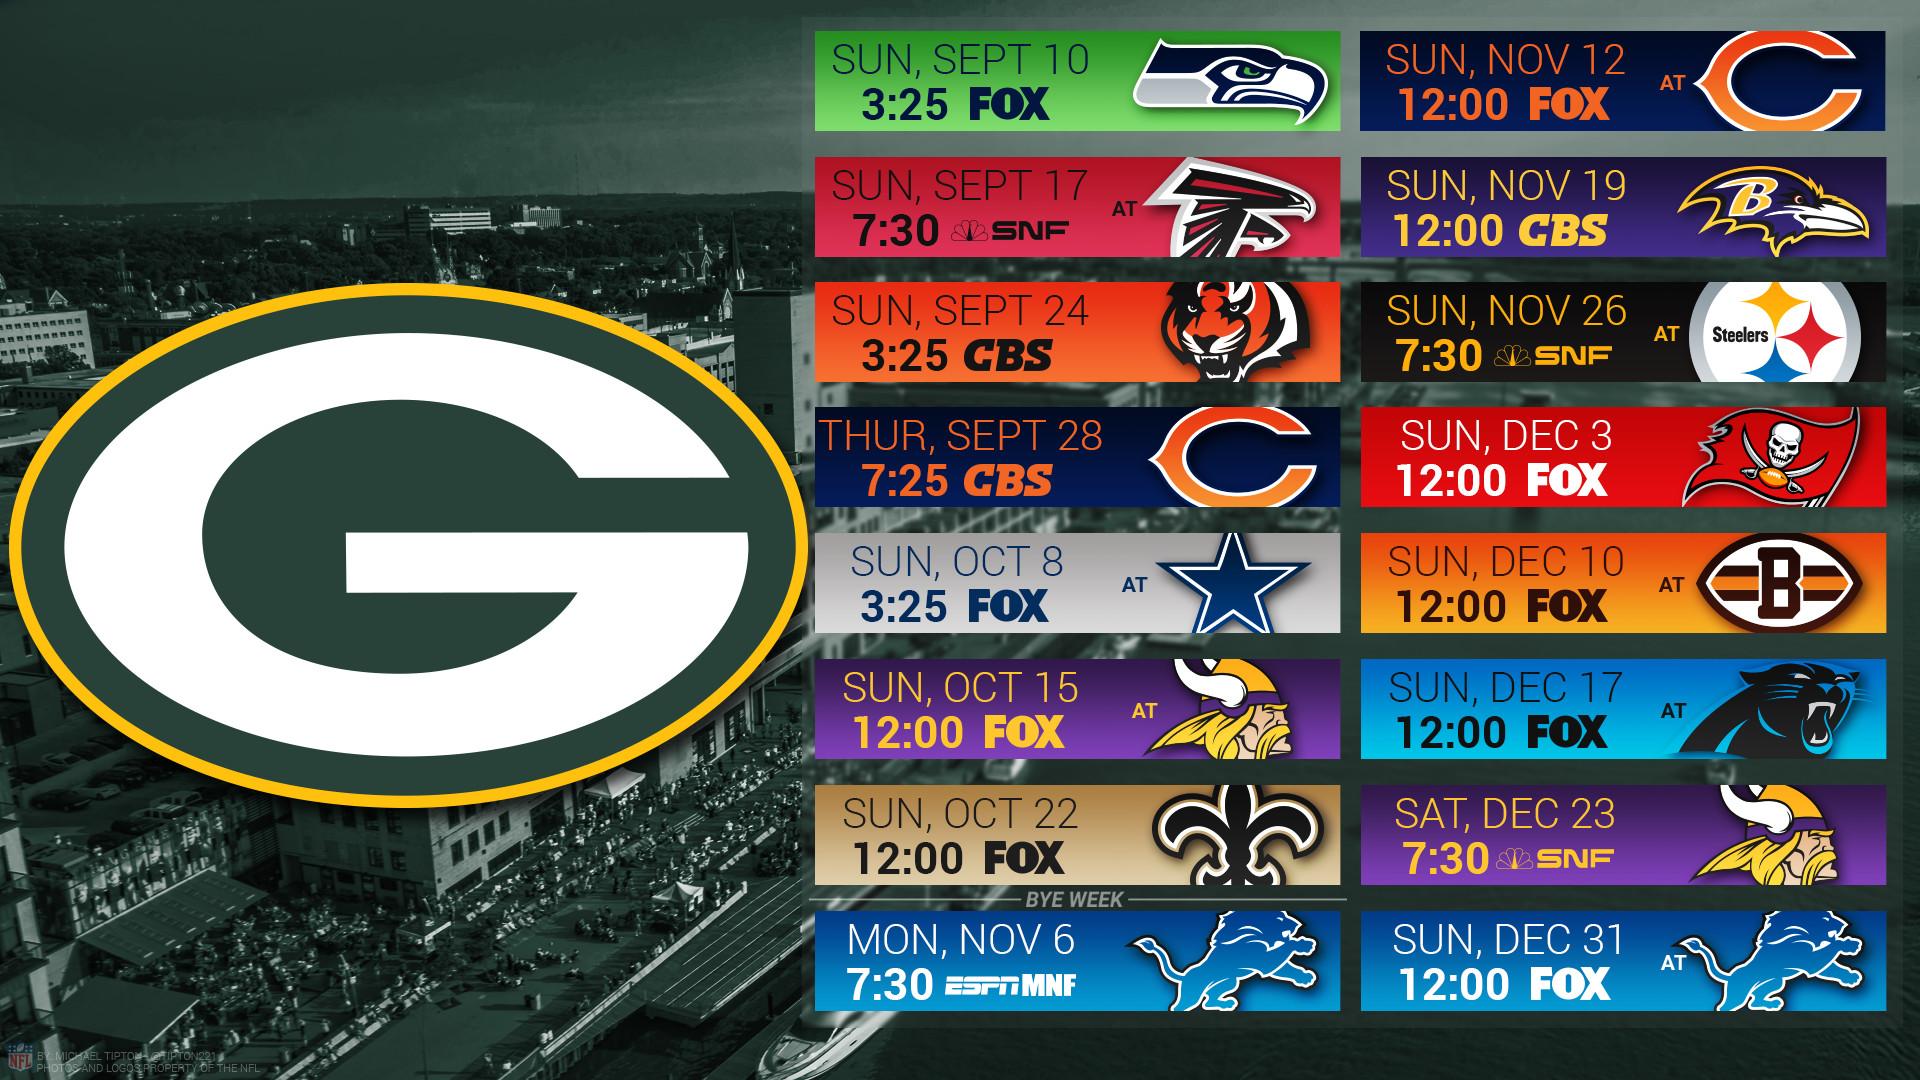 1920x1080 Green Bay Packers 2017 Schedule City Football Logo Wallpaper Free Pc Desktop Computer